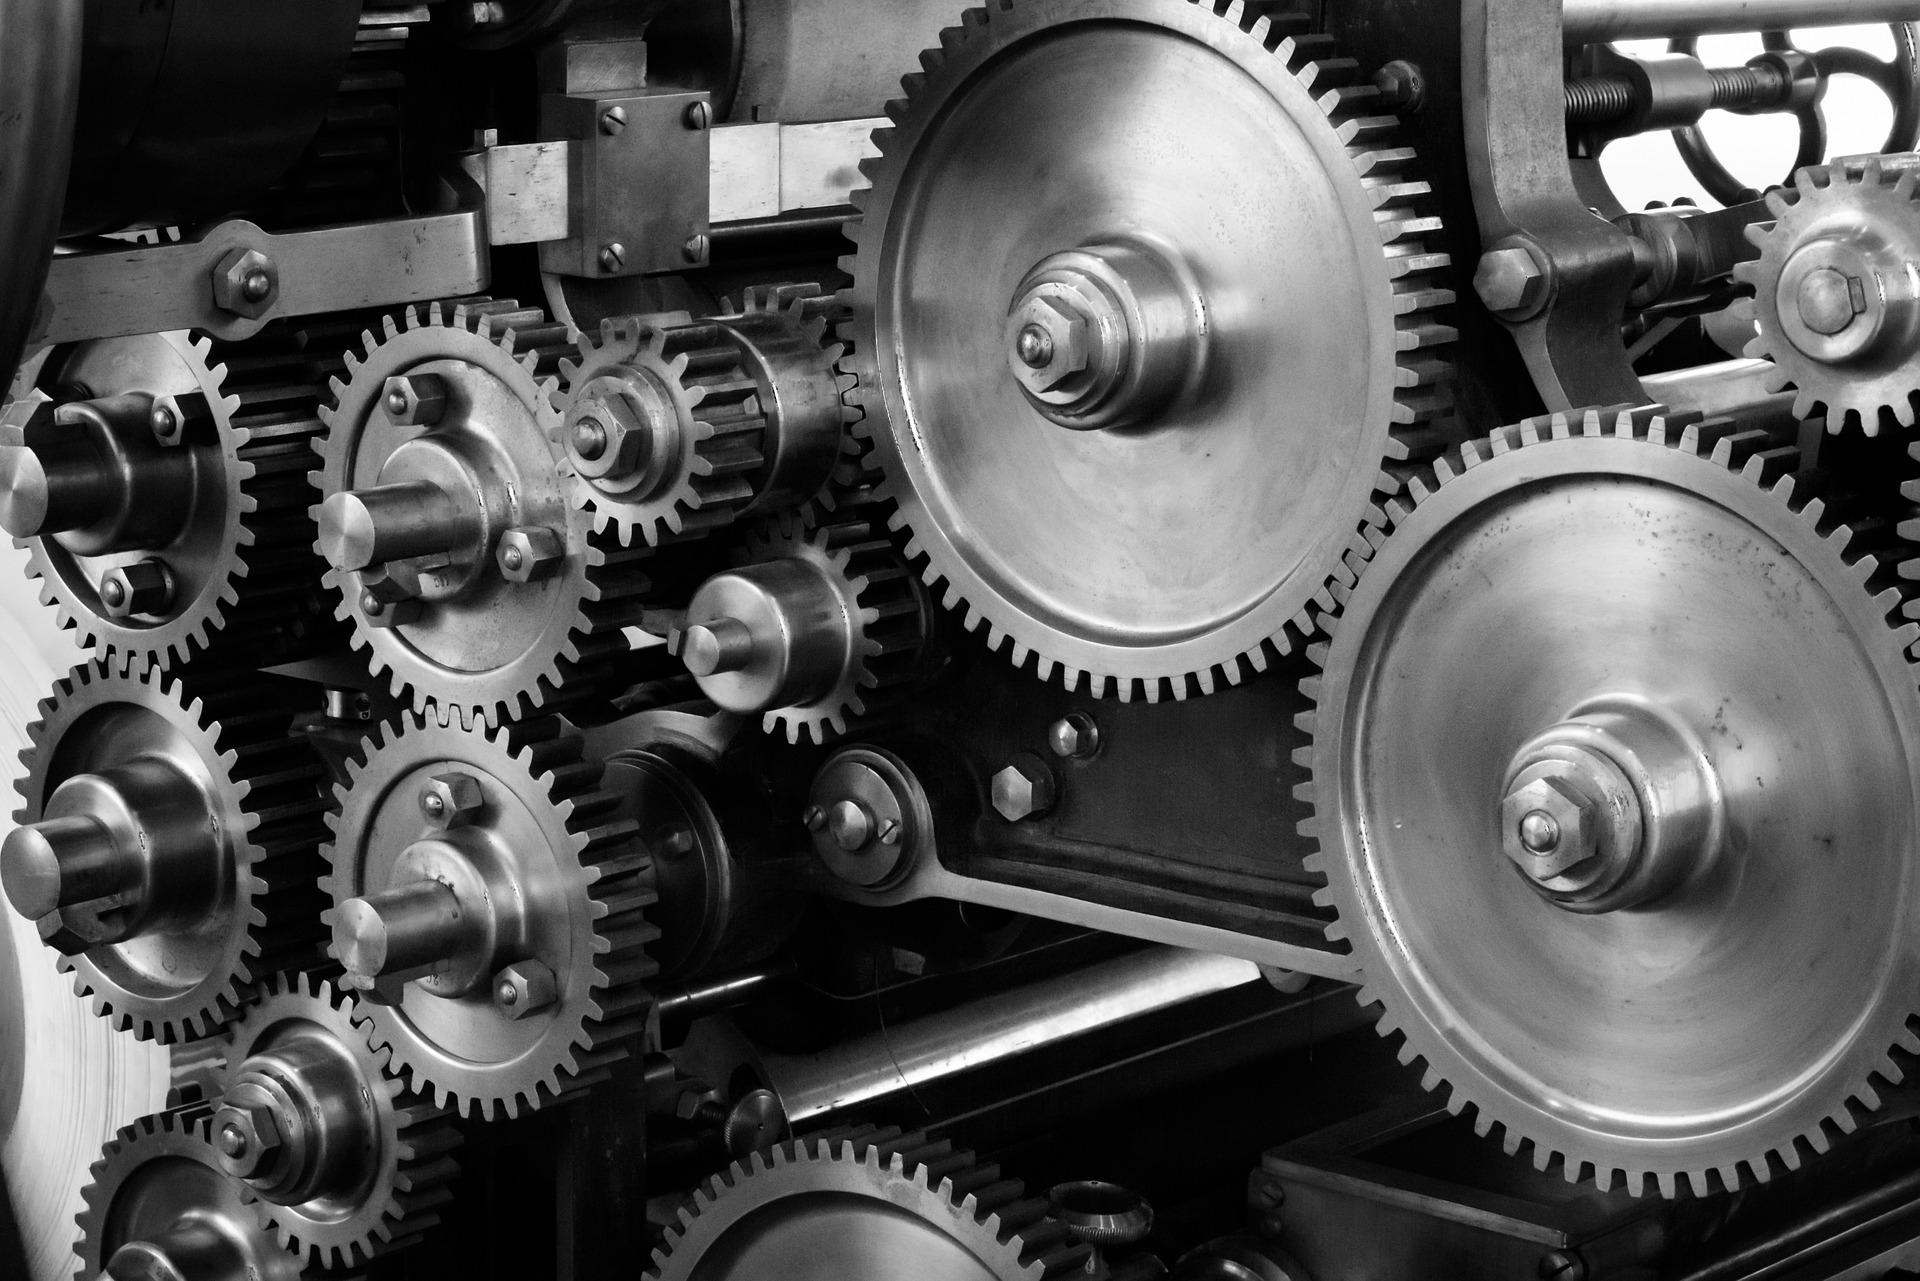 Utilaje la comanda, masini si echipamente industriale